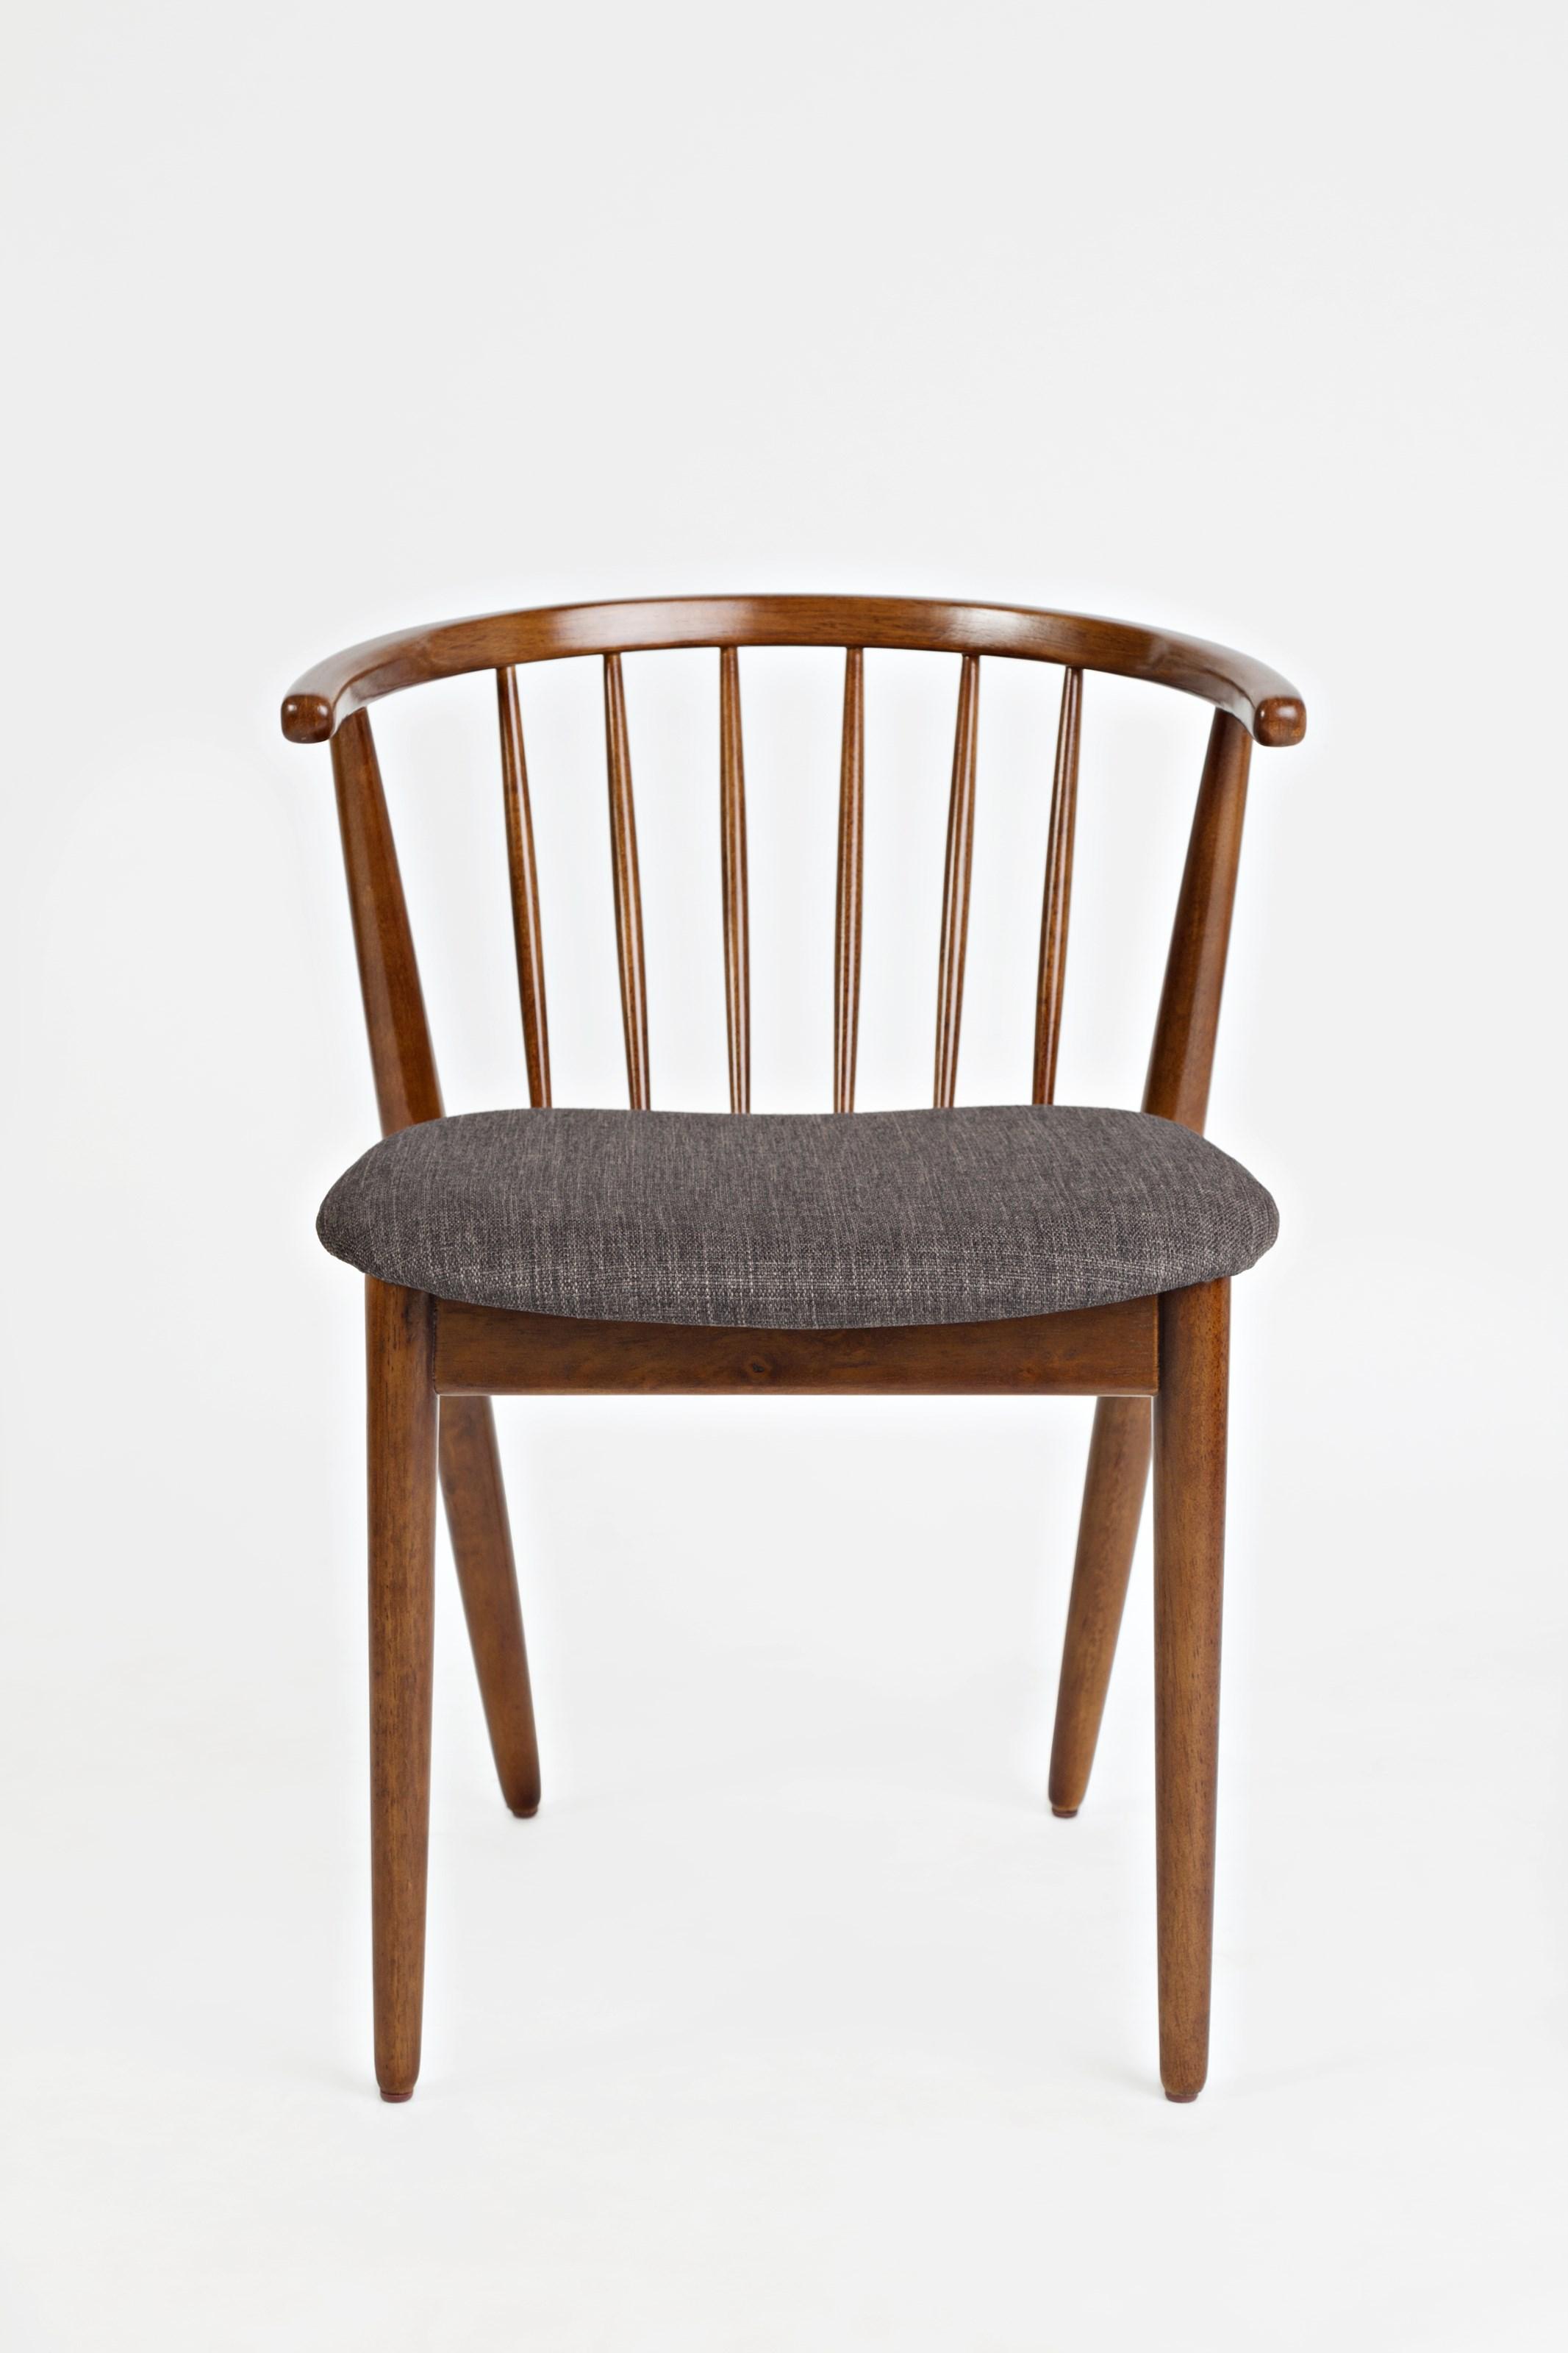 Copenhagen Side Chair by Jofran at Jofran